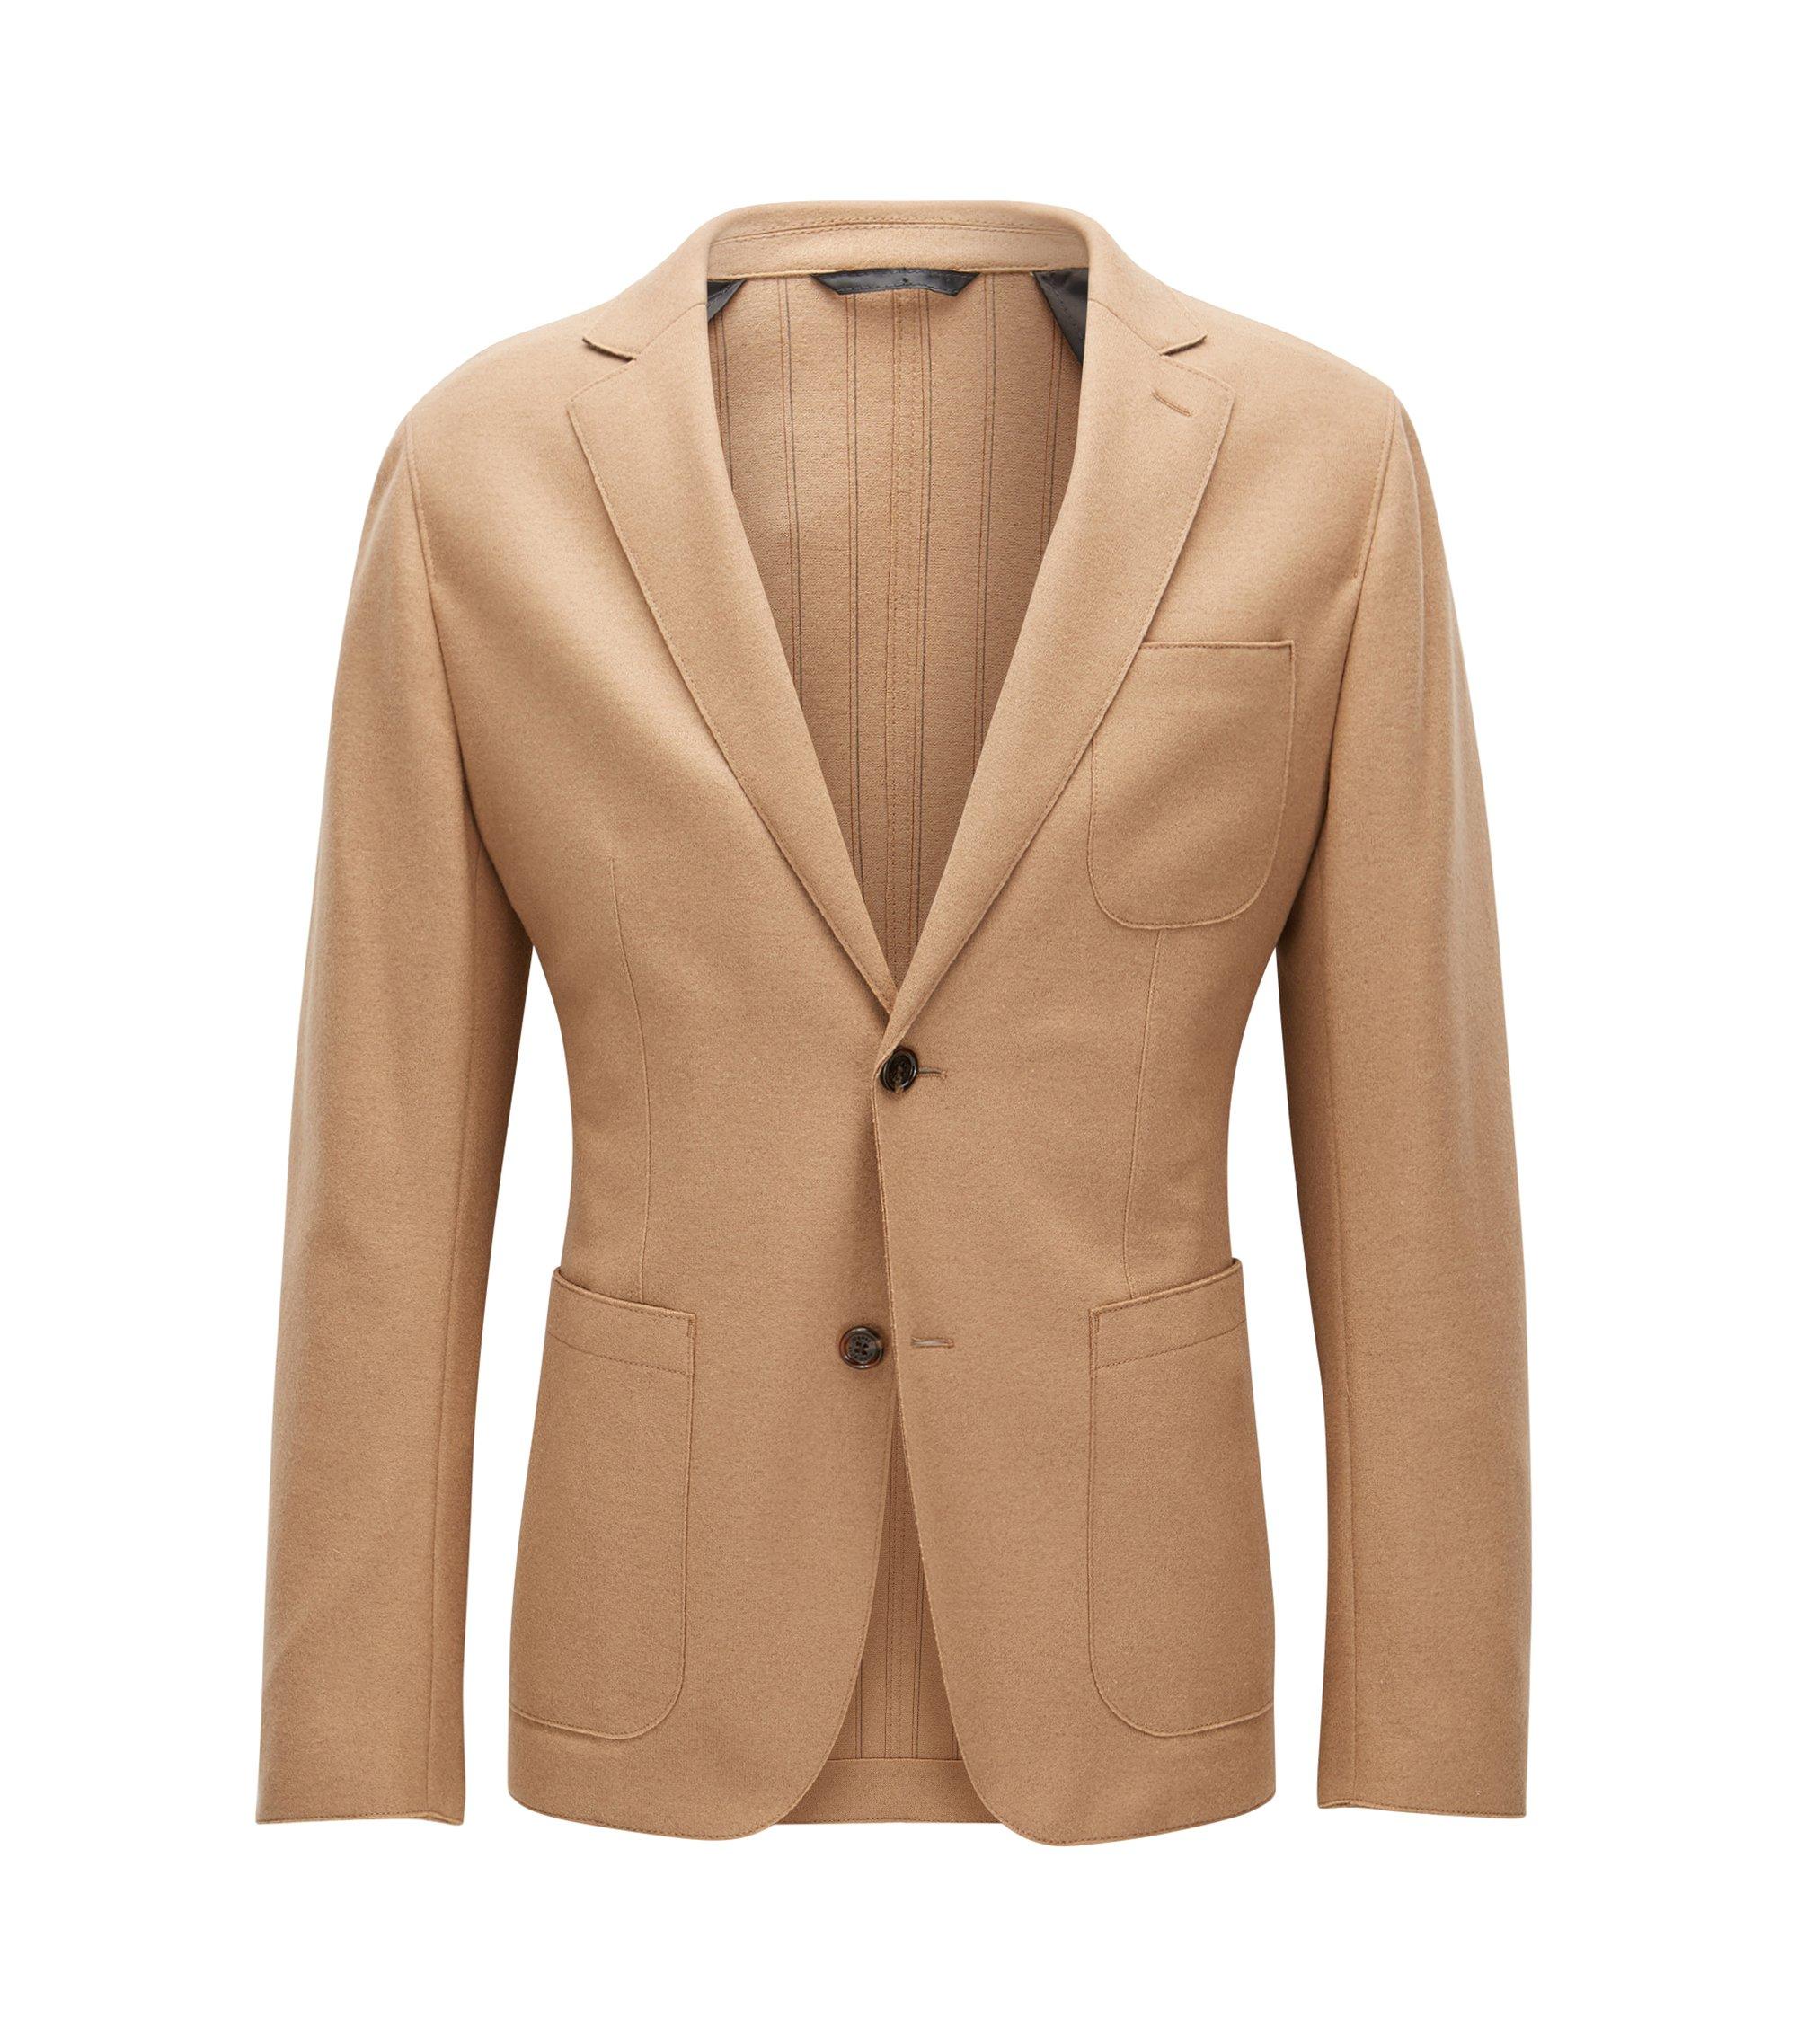 Virgin Wool Sport Coat, Slim Fit | Nordin, Beige